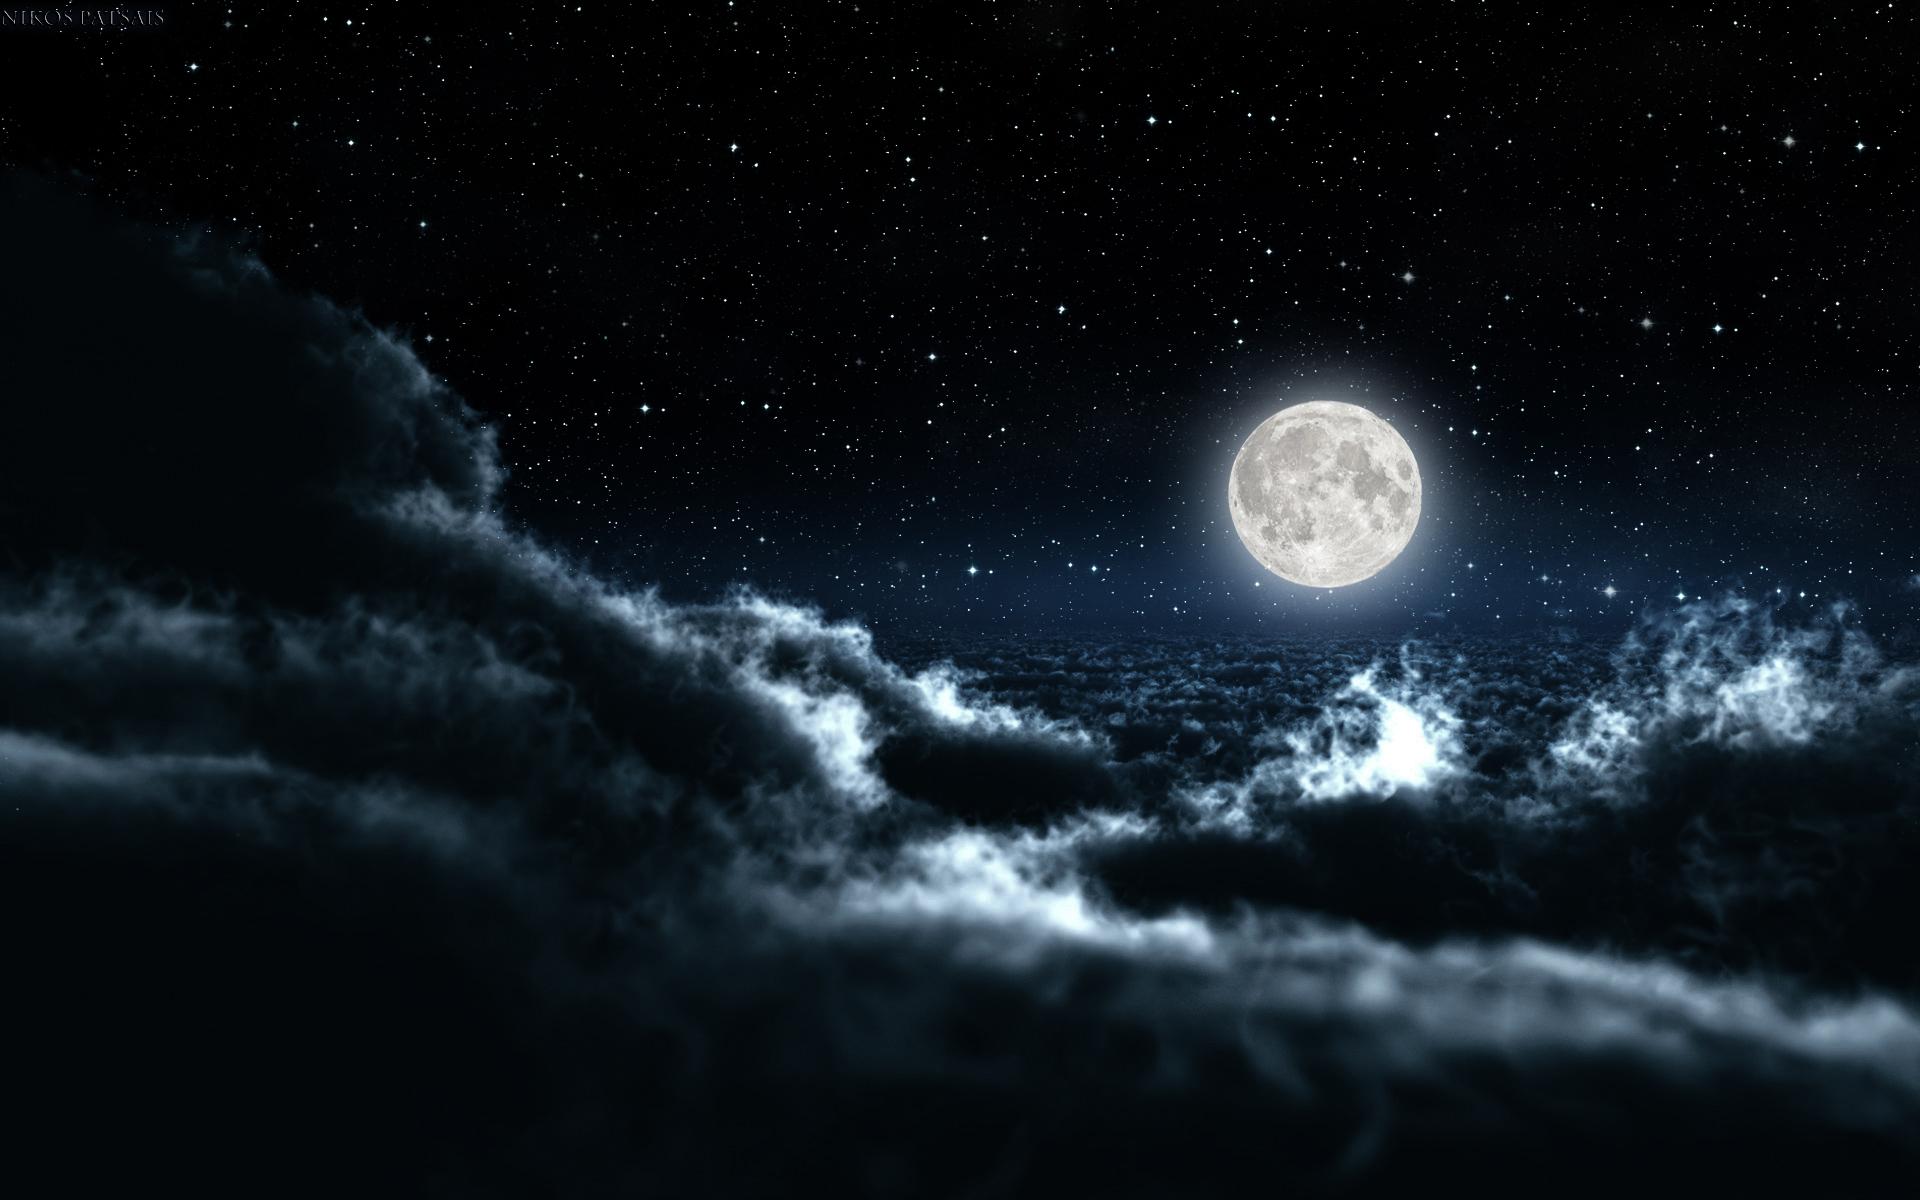 Pics Photos   Night Sky Hd Wallpaper 150x150 Night Sky Hd 1920x1200